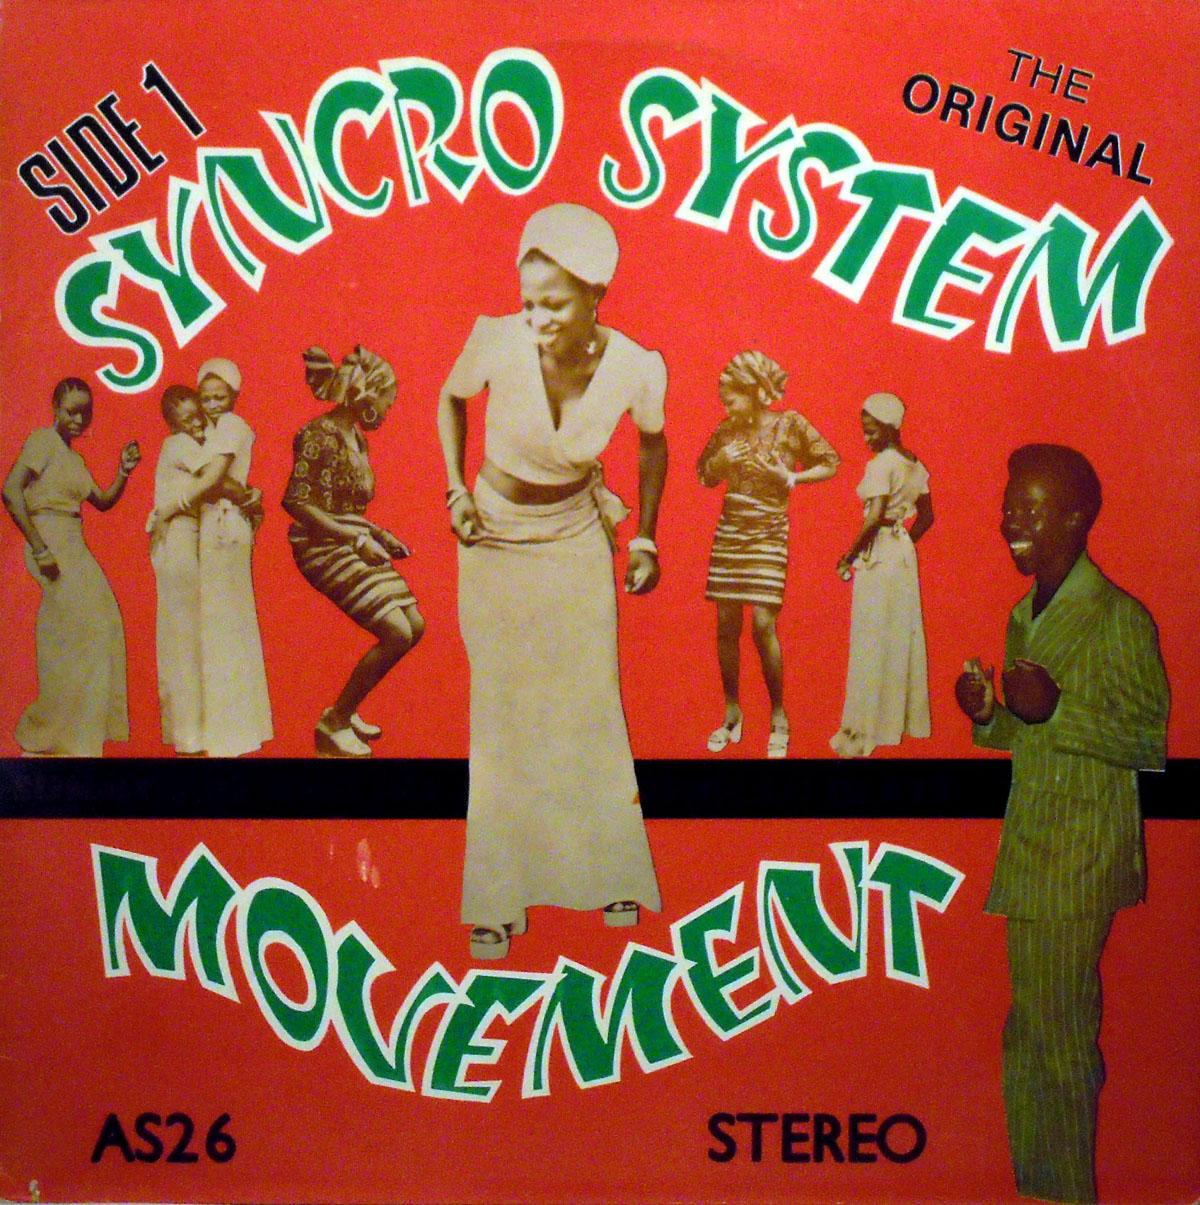 original syncro system